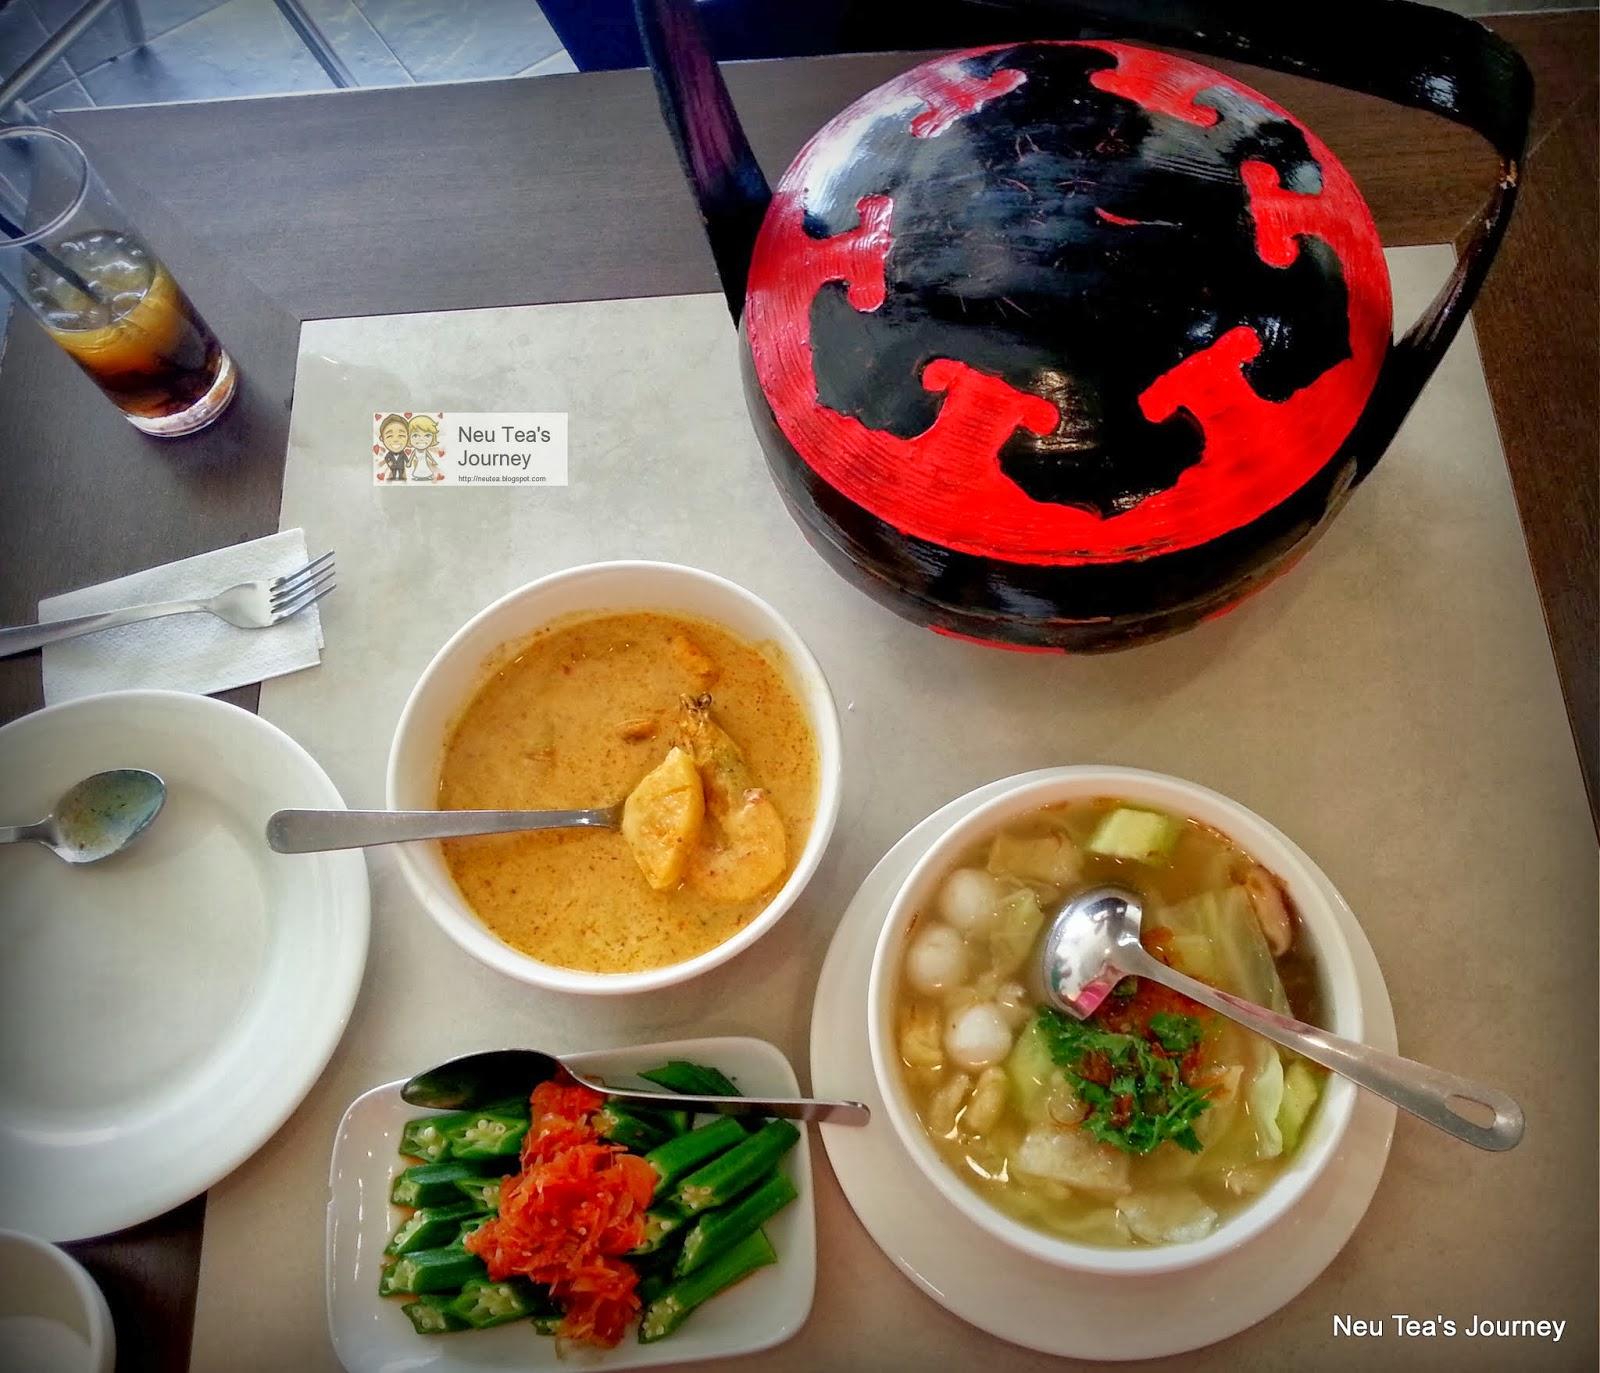 Neu tea 39 s journey amy heritage nyonya cuisine restoran for Amy heritage nyonya cuisine